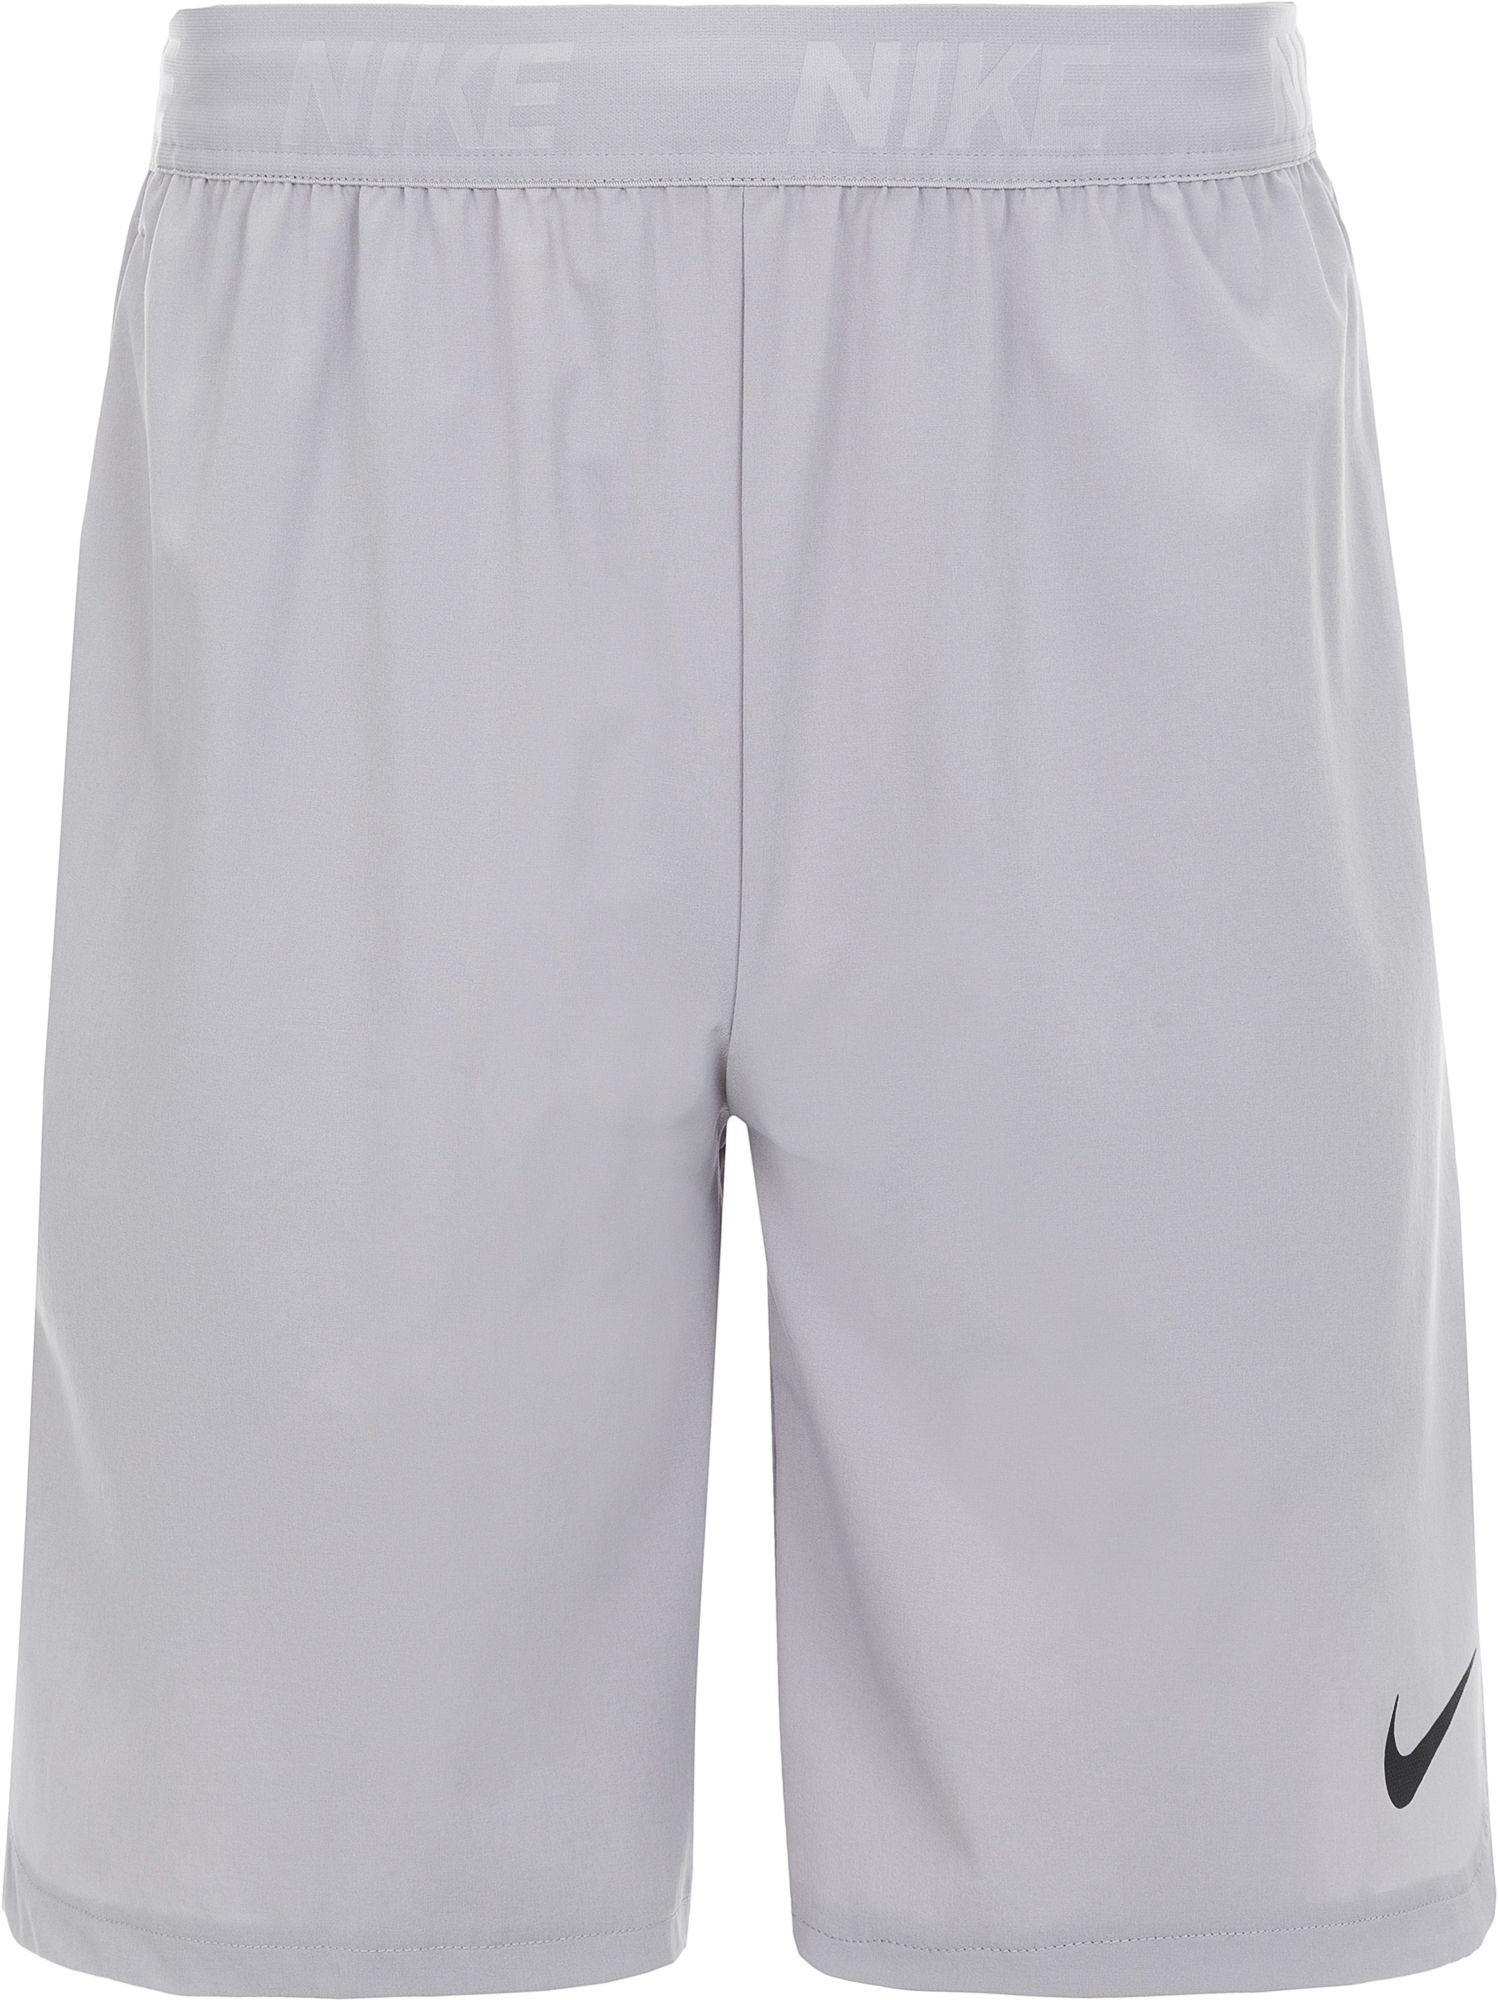 Nike Шорты мужские Nike Flex, размер 50-52